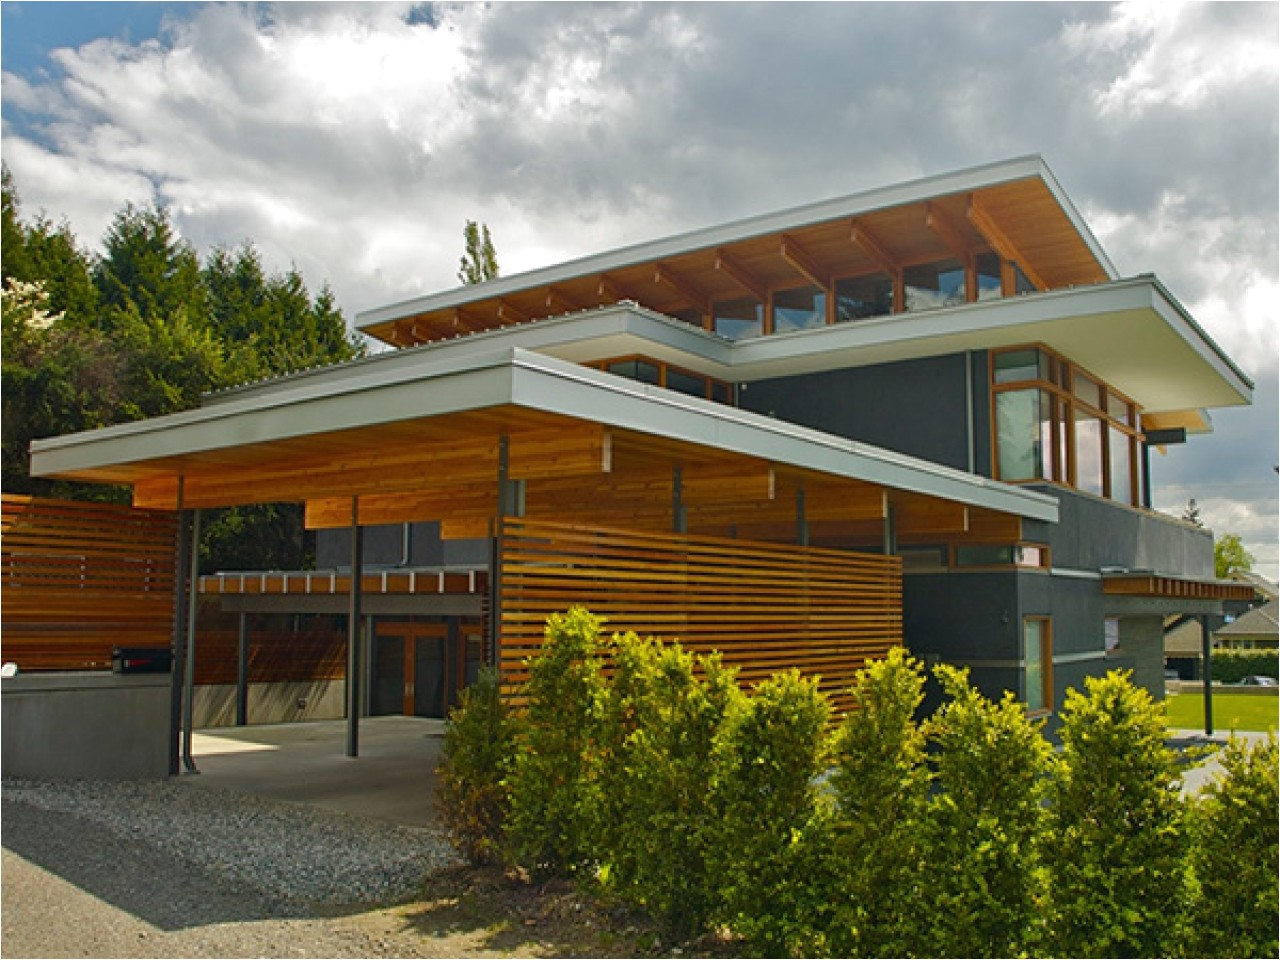 e60a1e121d3221a1 west coast modern architecture modern residential architecture